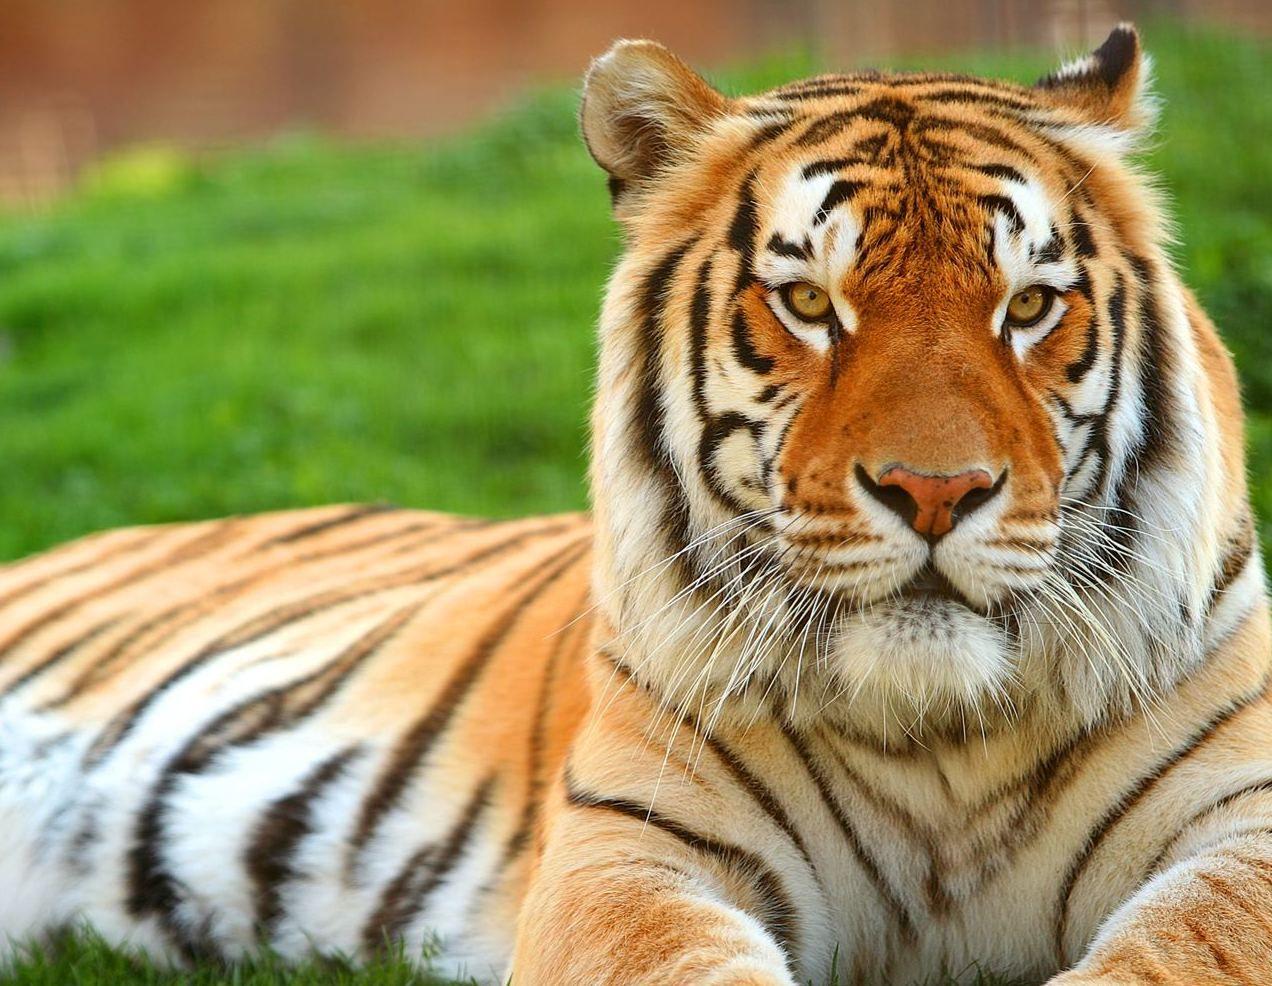 Free Tiger Wallpaper Desktop Tiger Wallpapers Hd Tiger Wallpaper Tiger Pictures Pet Tiger